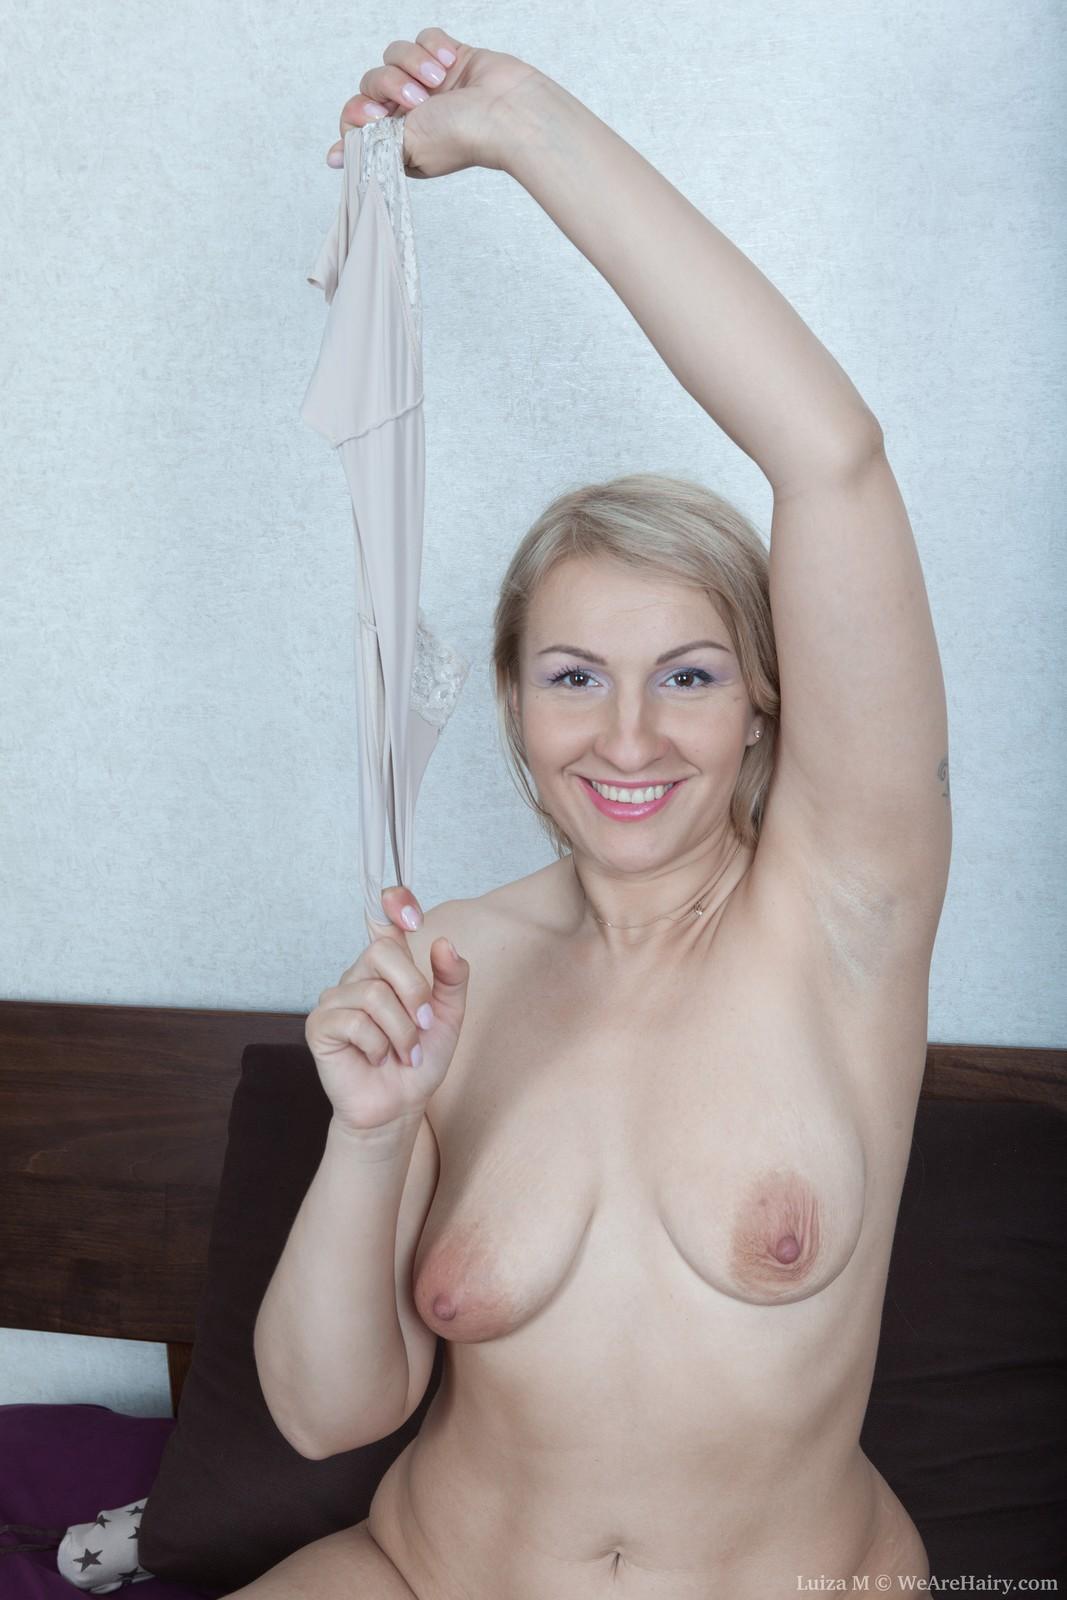 wpid-luiza-m-masturbates-with-her-vibrator7.jpg